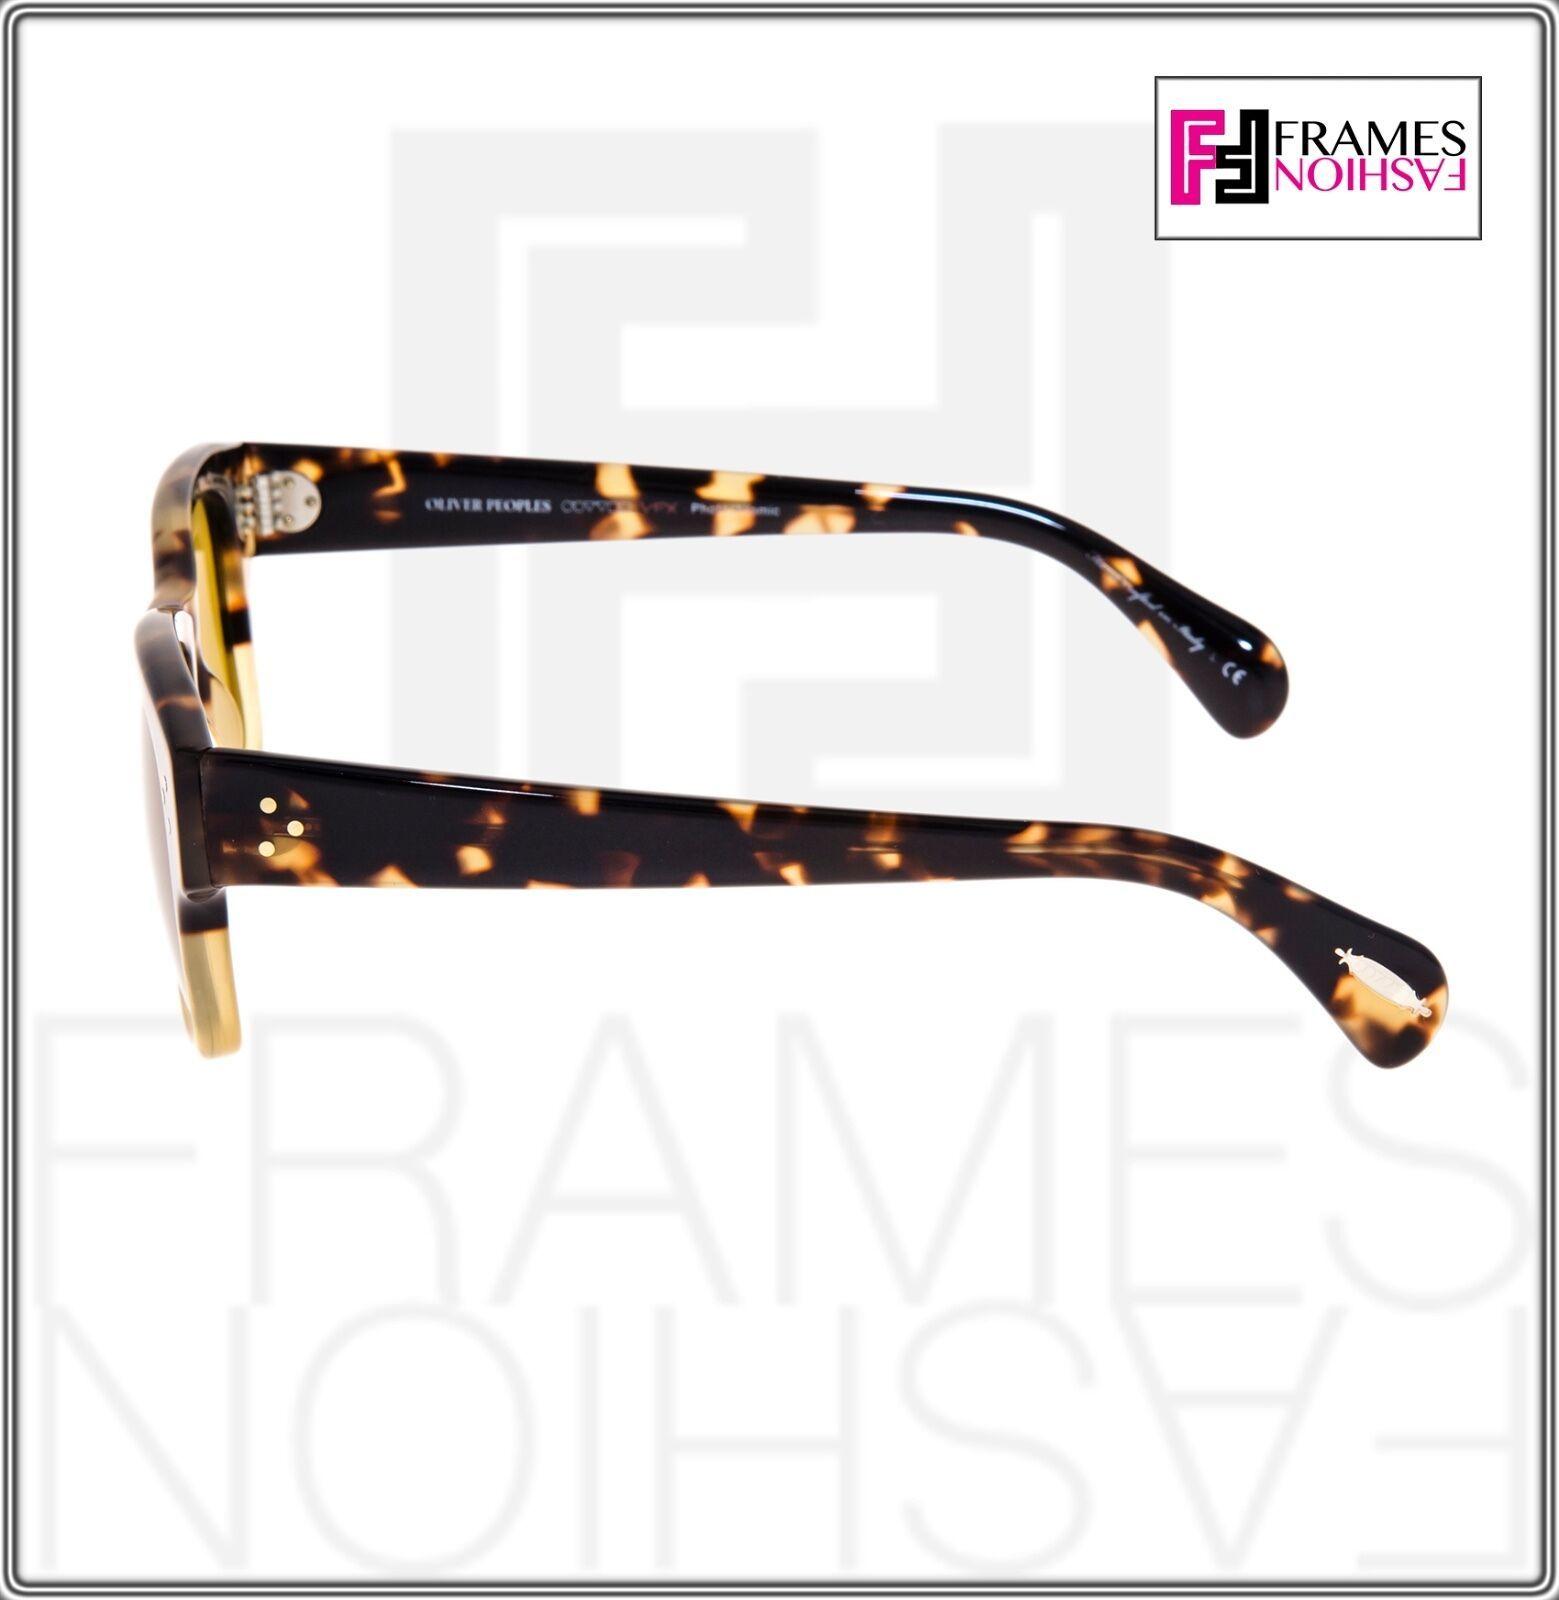 OLIVER PEOPLES Jannsson Sun OV5242S Honey Brown VFX Photochromic Sunglasses 5242 image 2